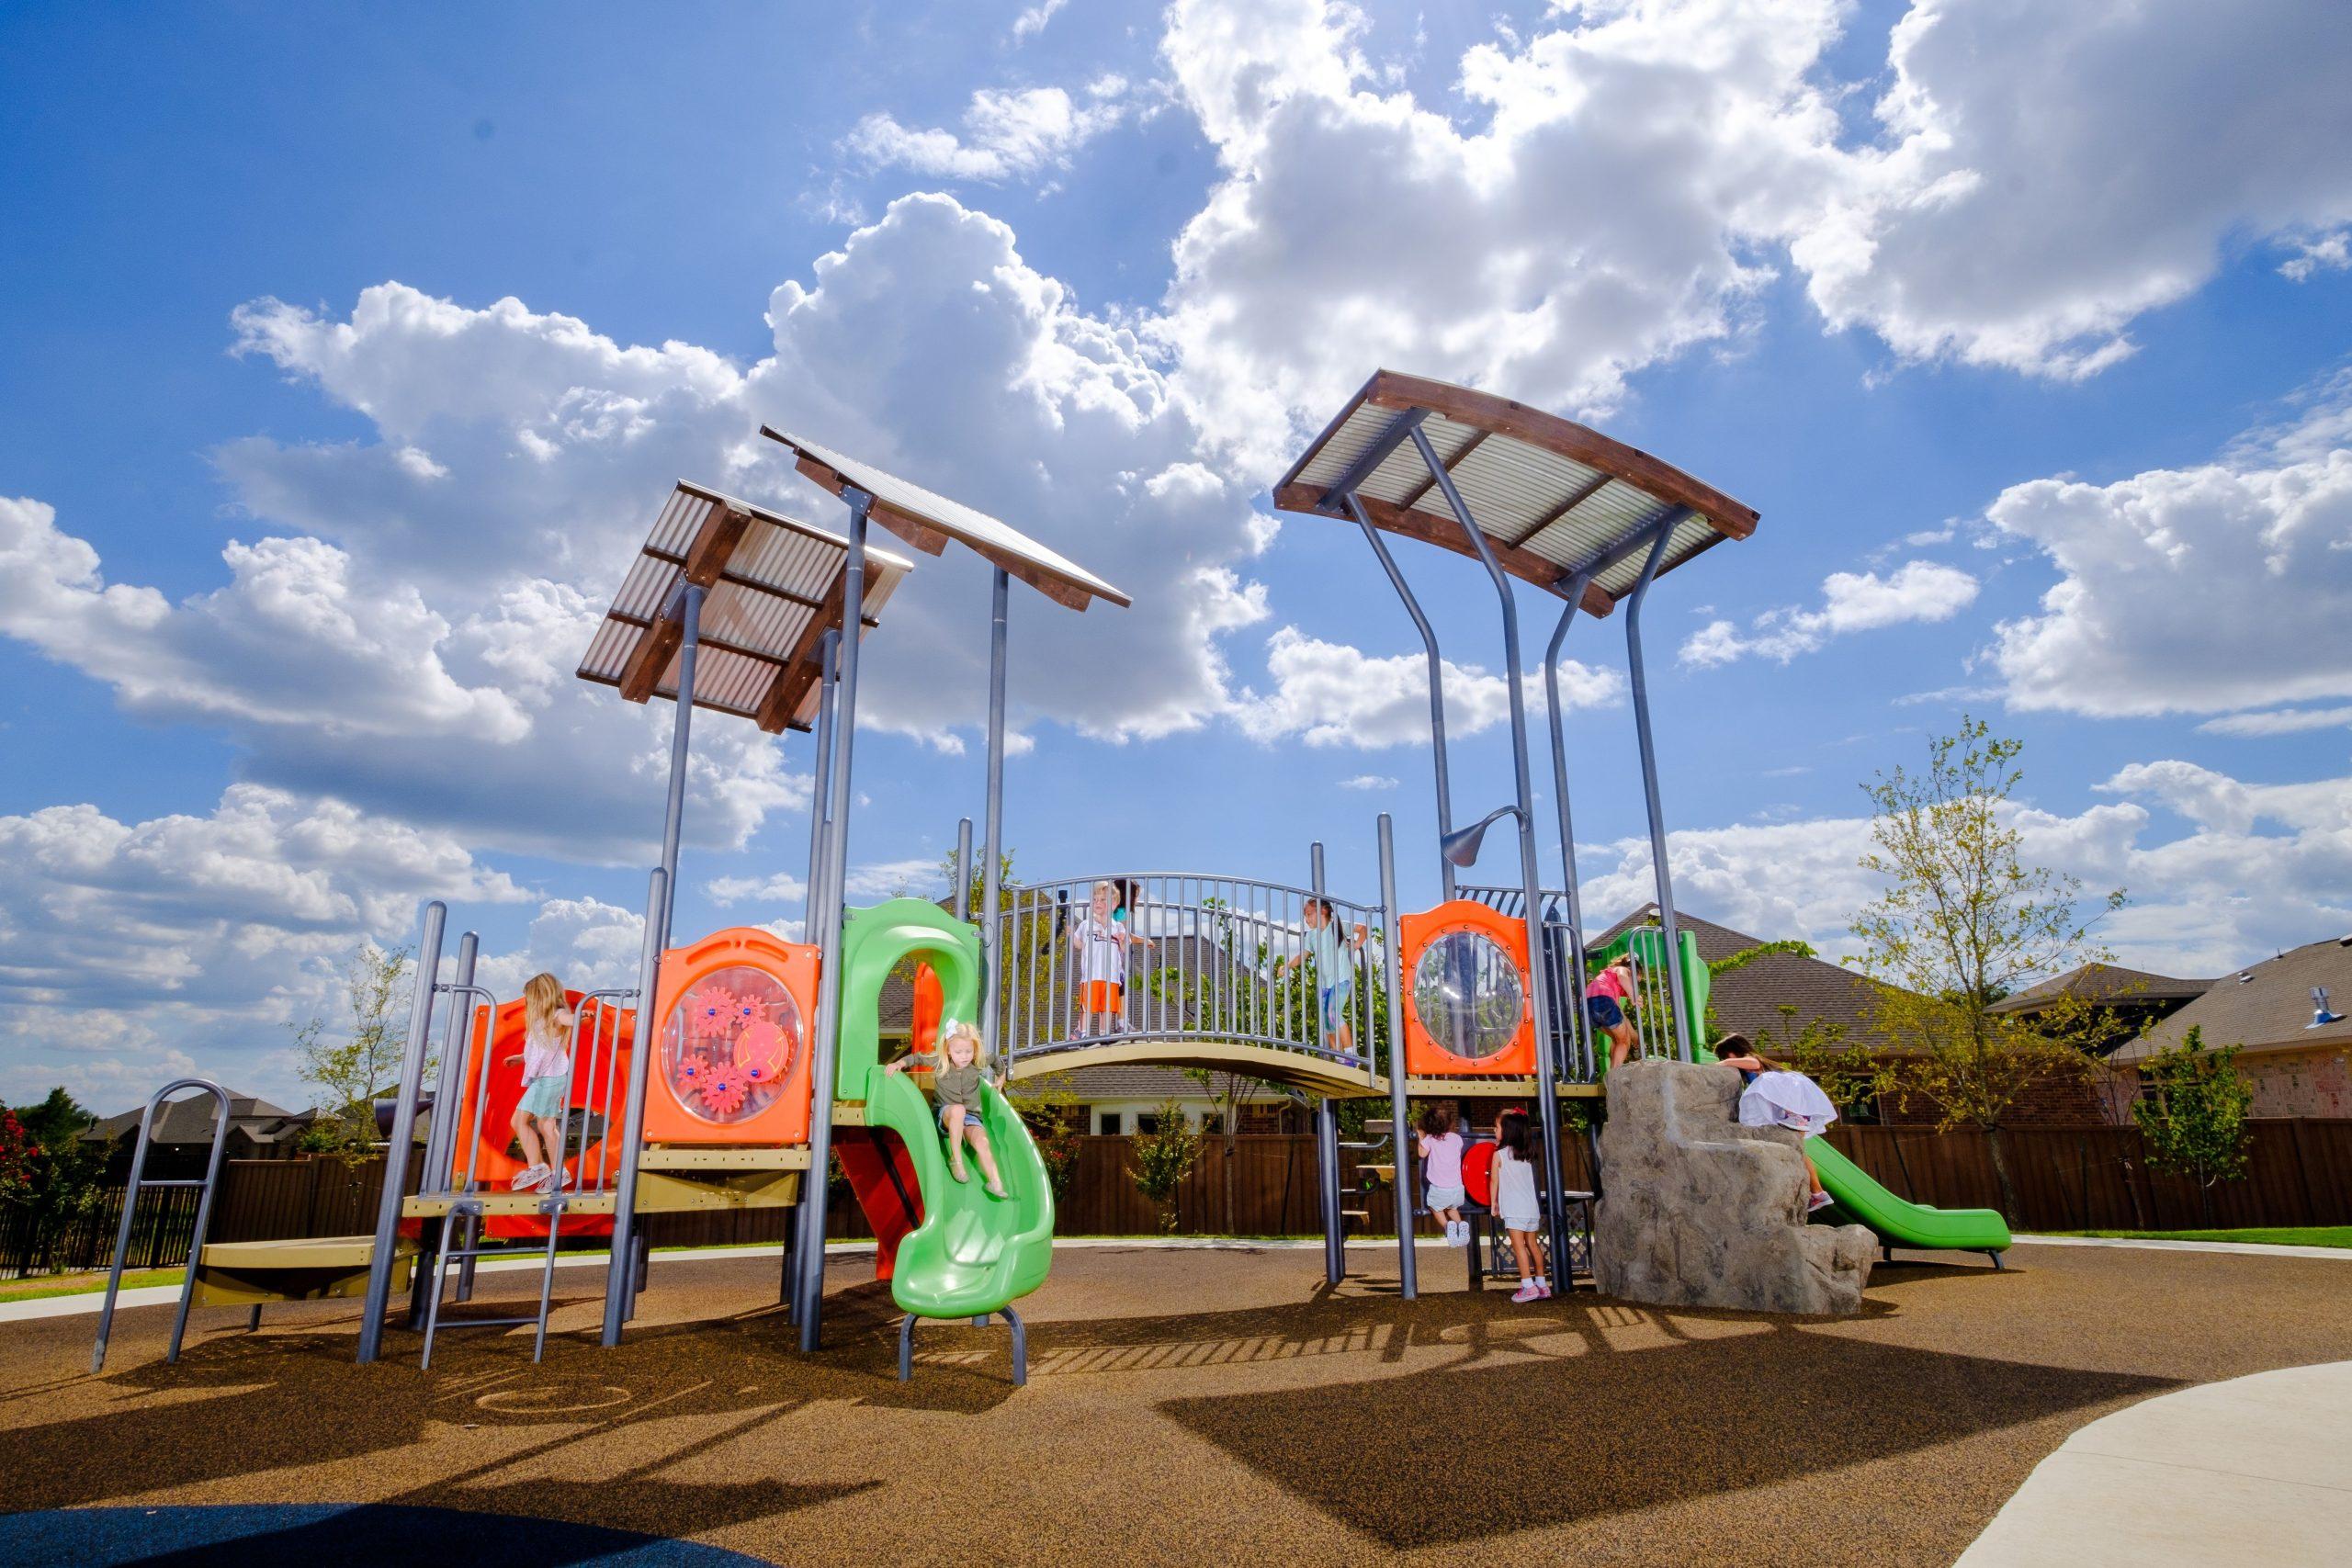 NU-Edge playground structure